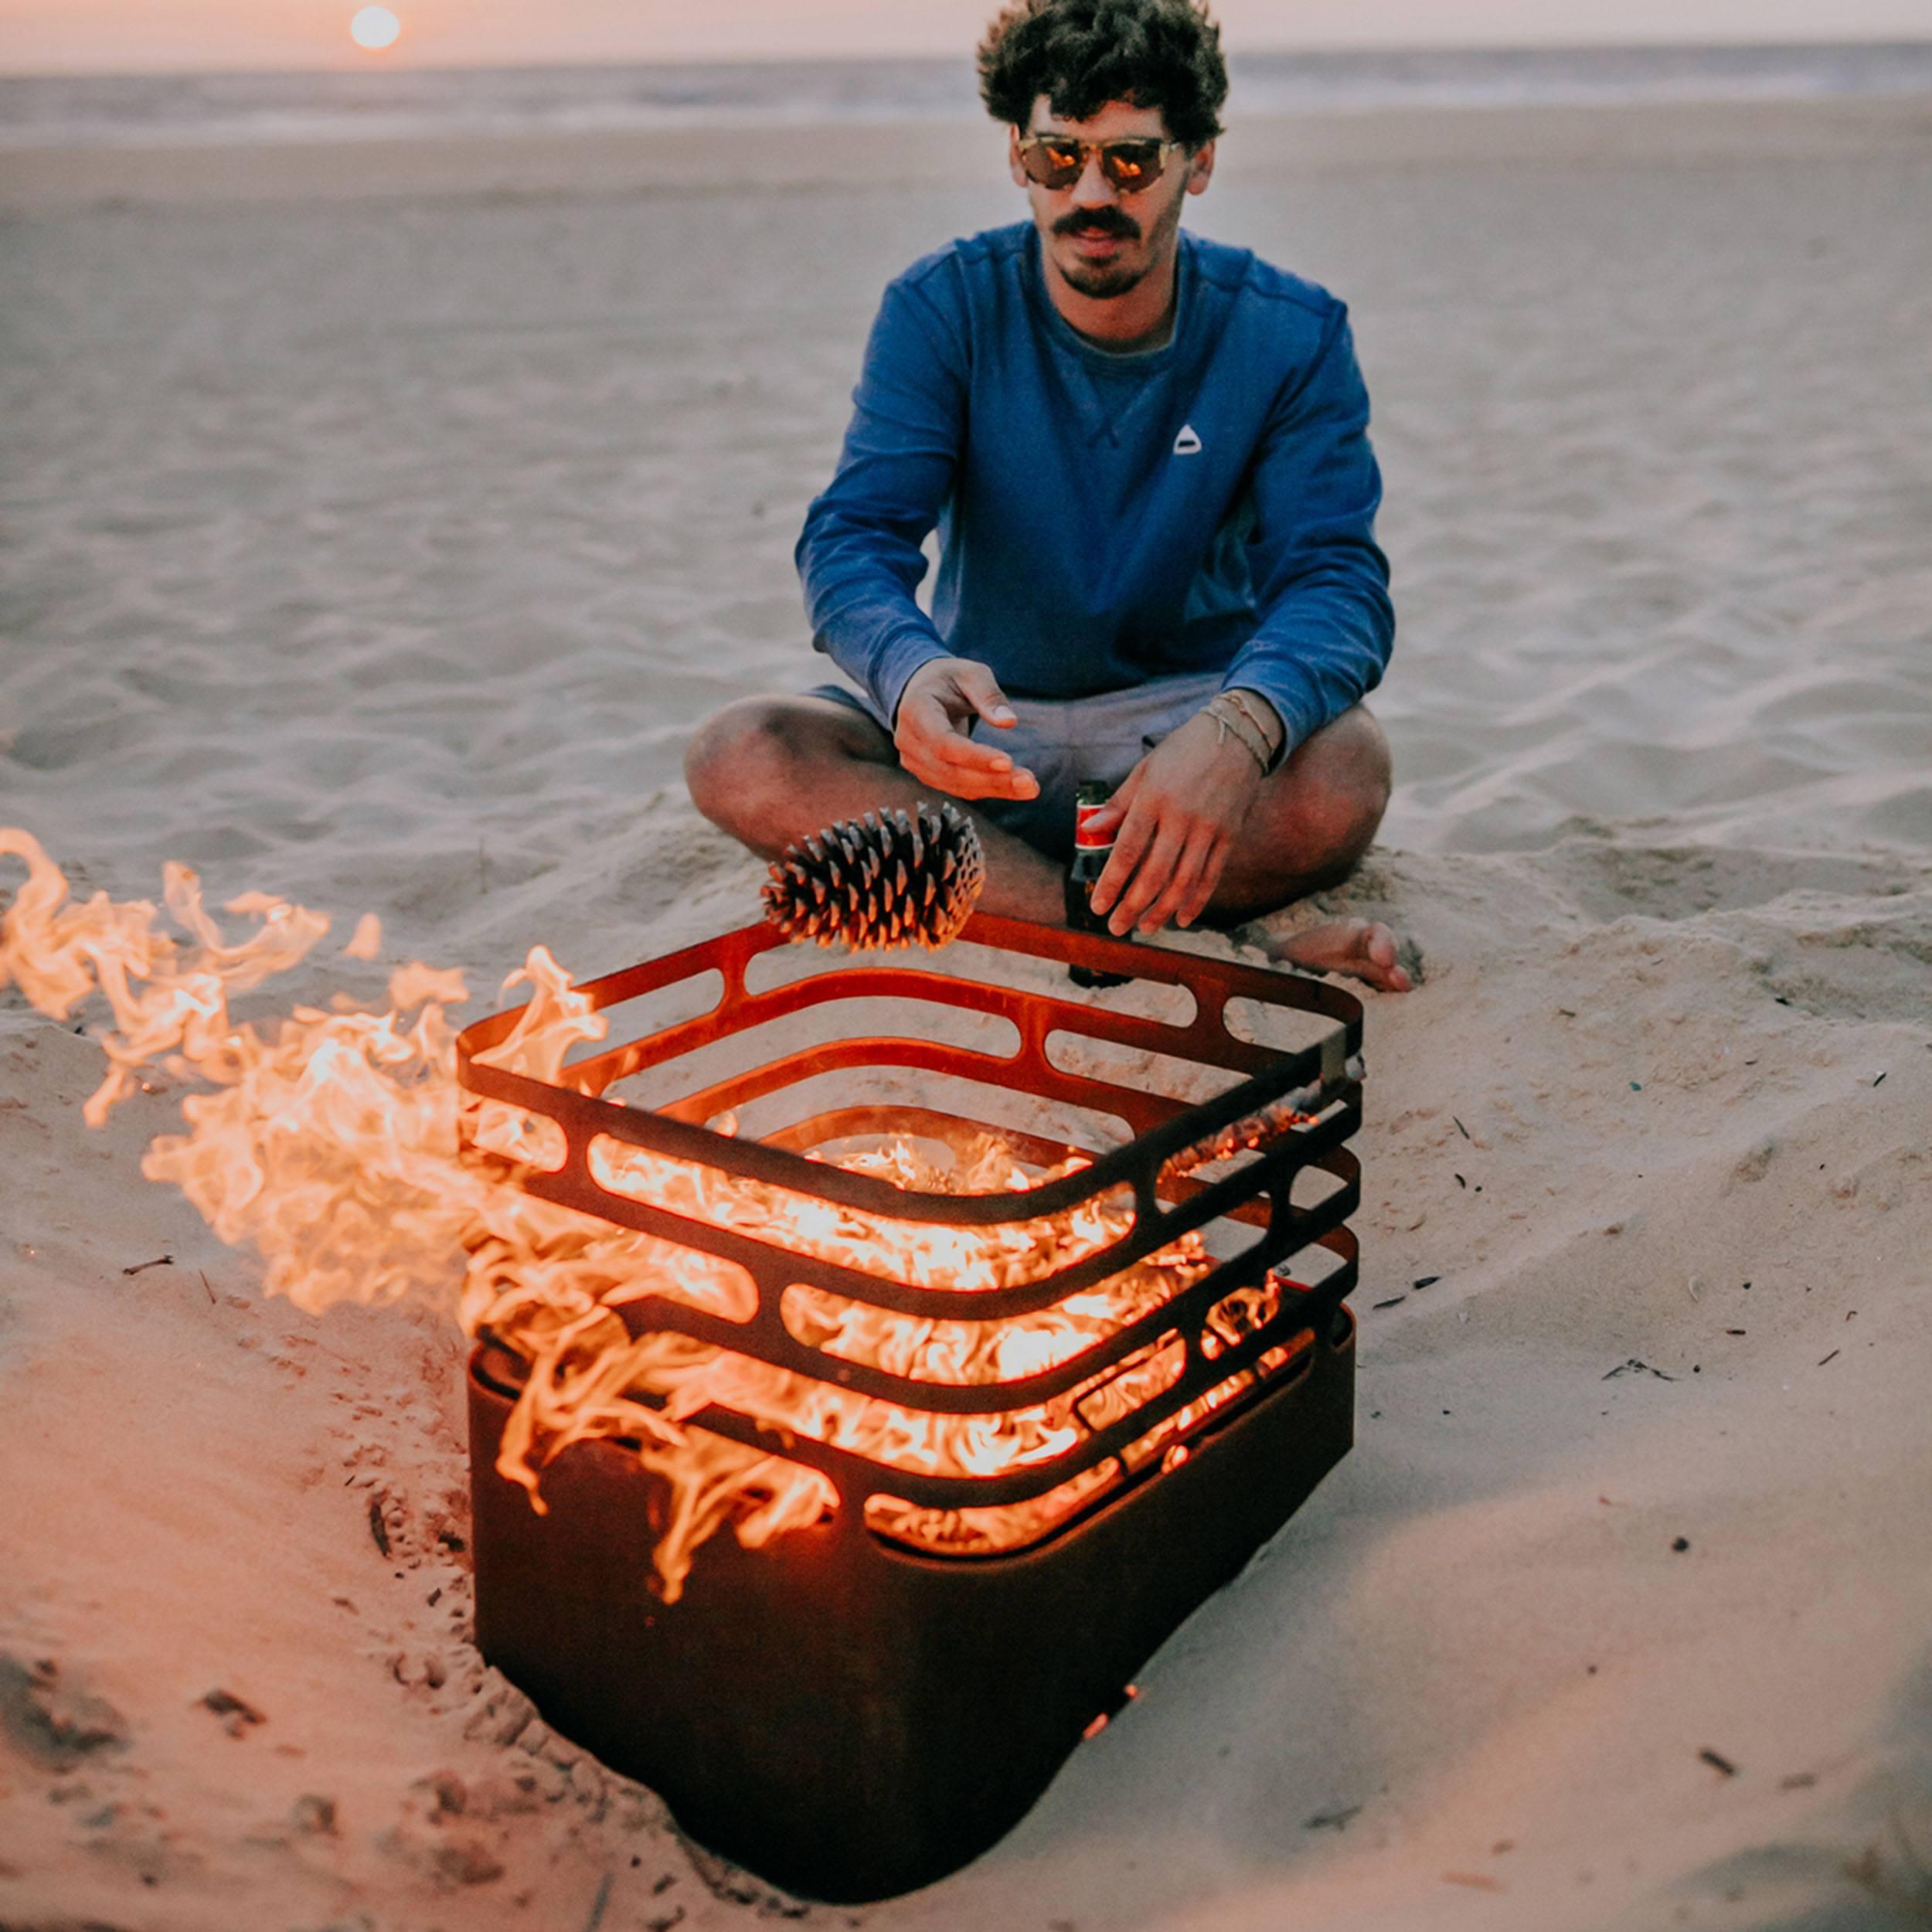 Cube Feuerkorb